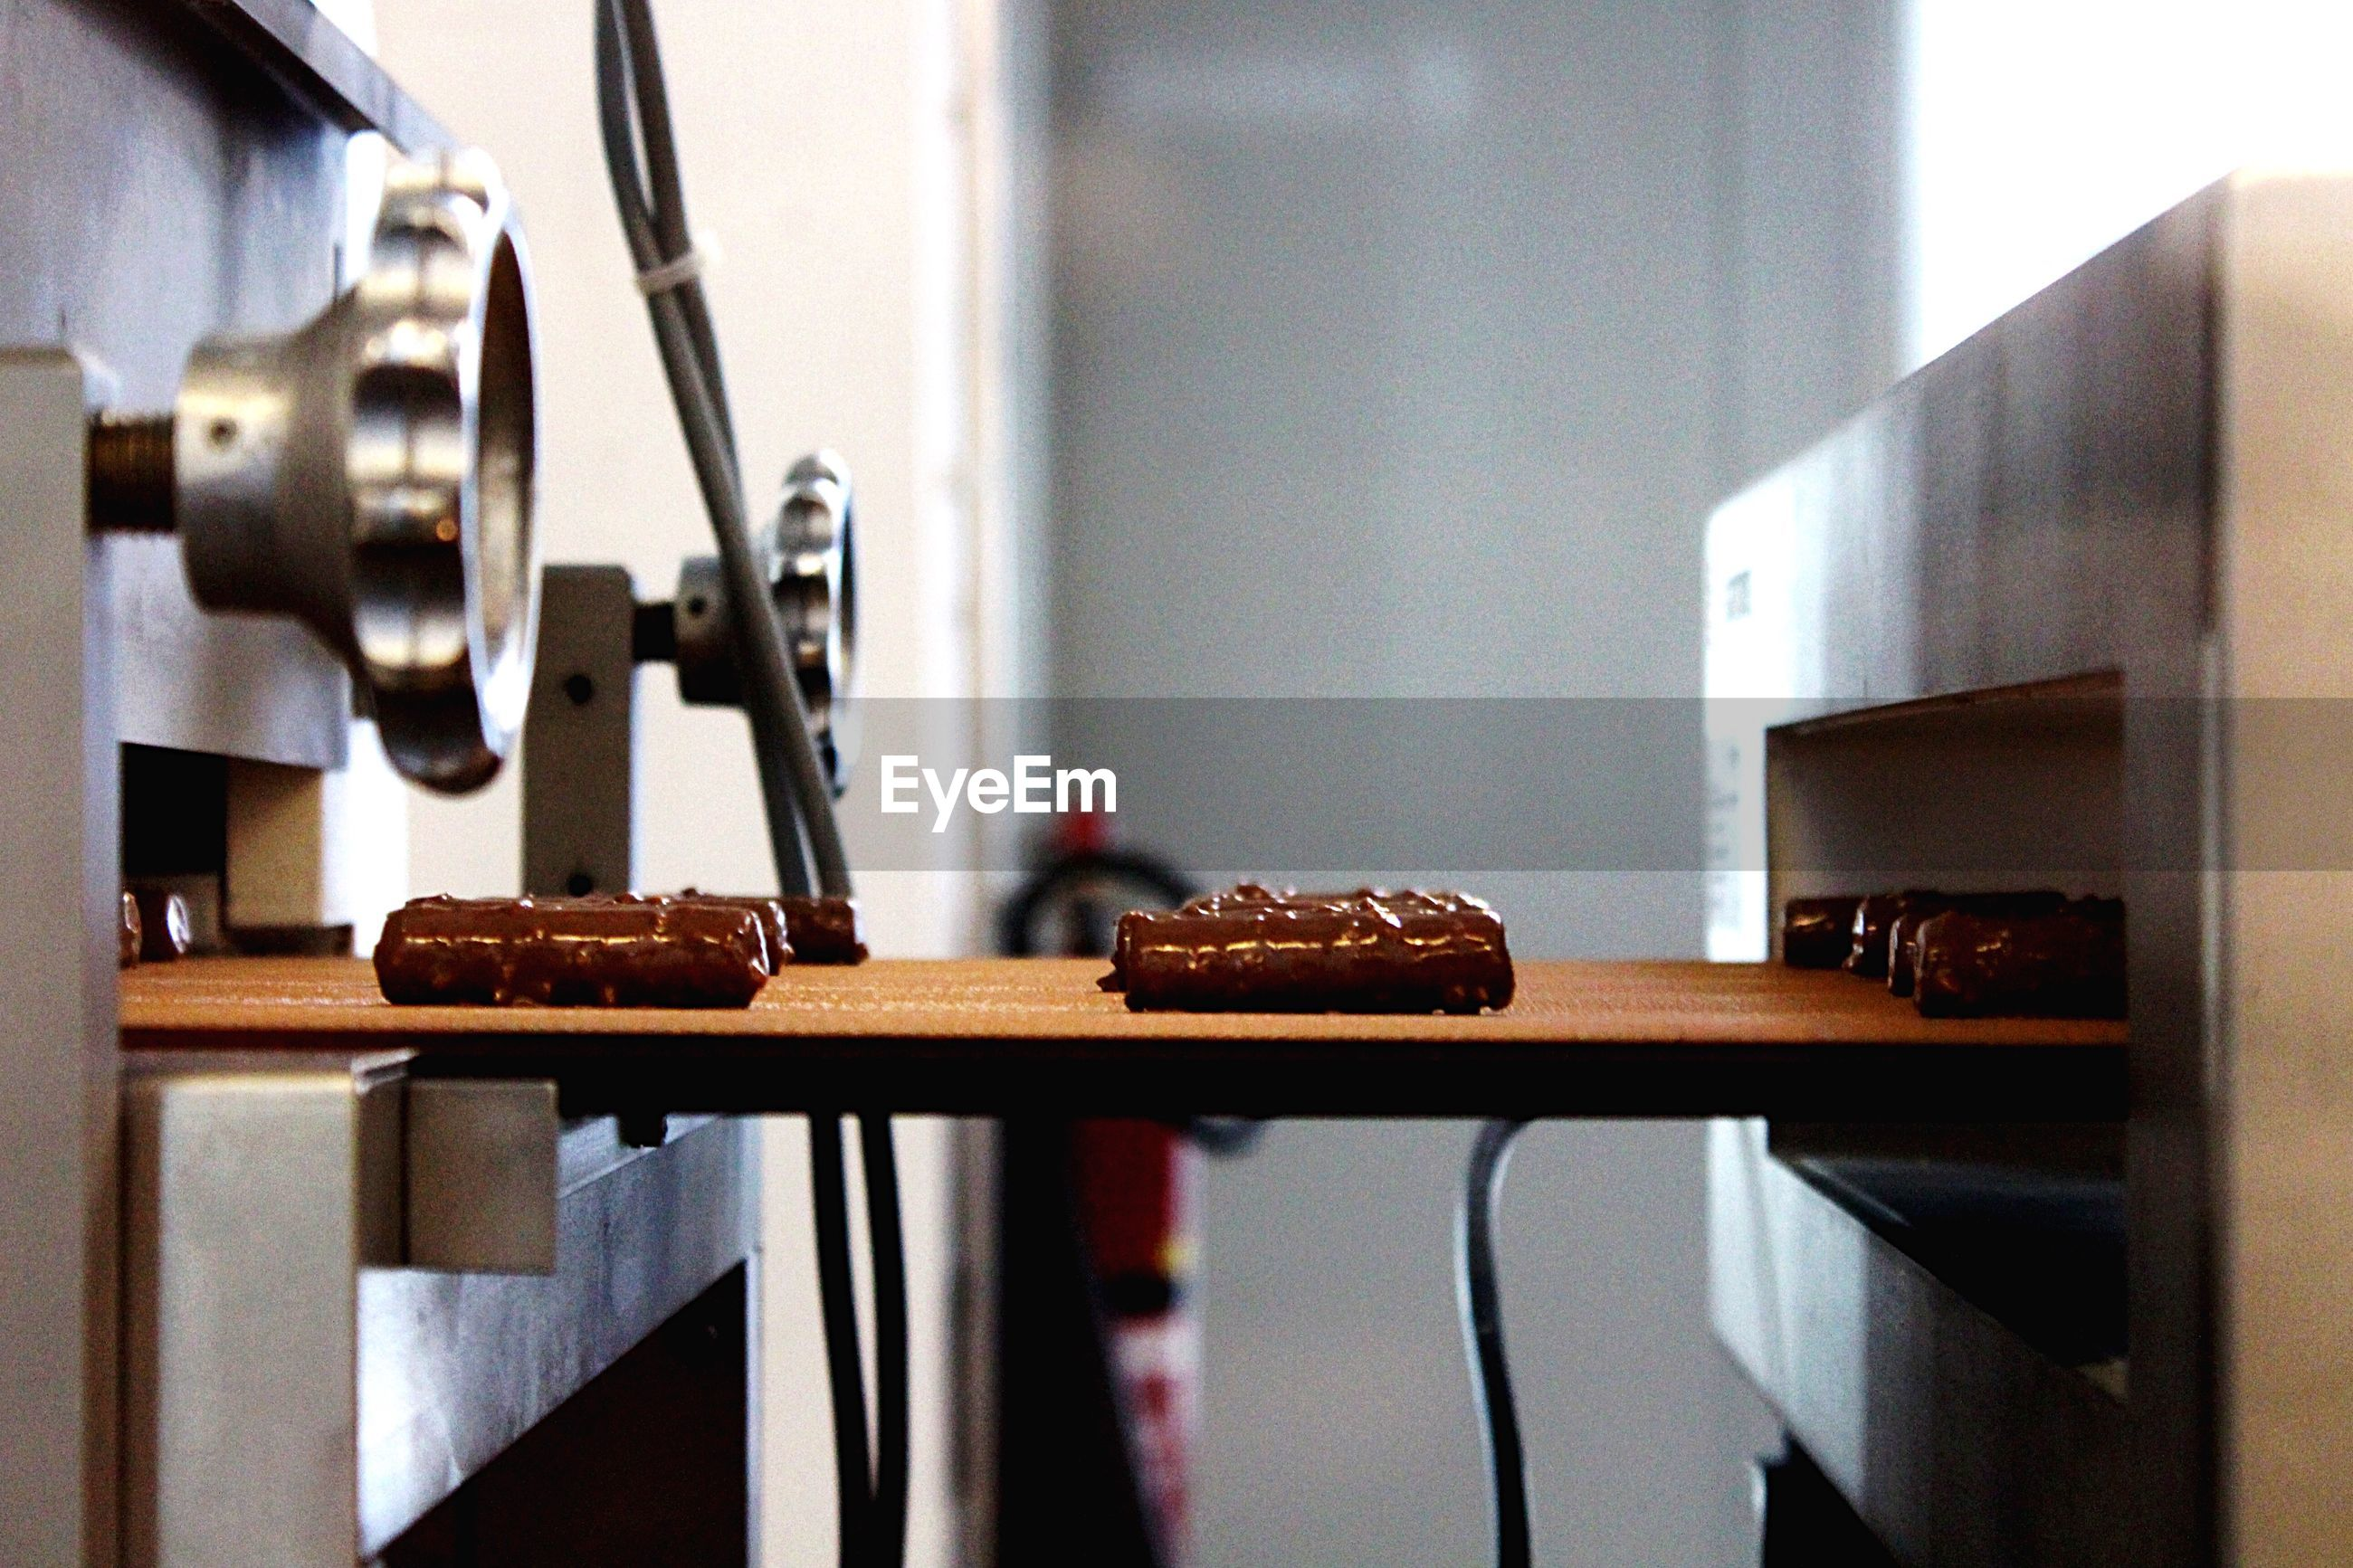 Chocolates on conveyor belt in factory